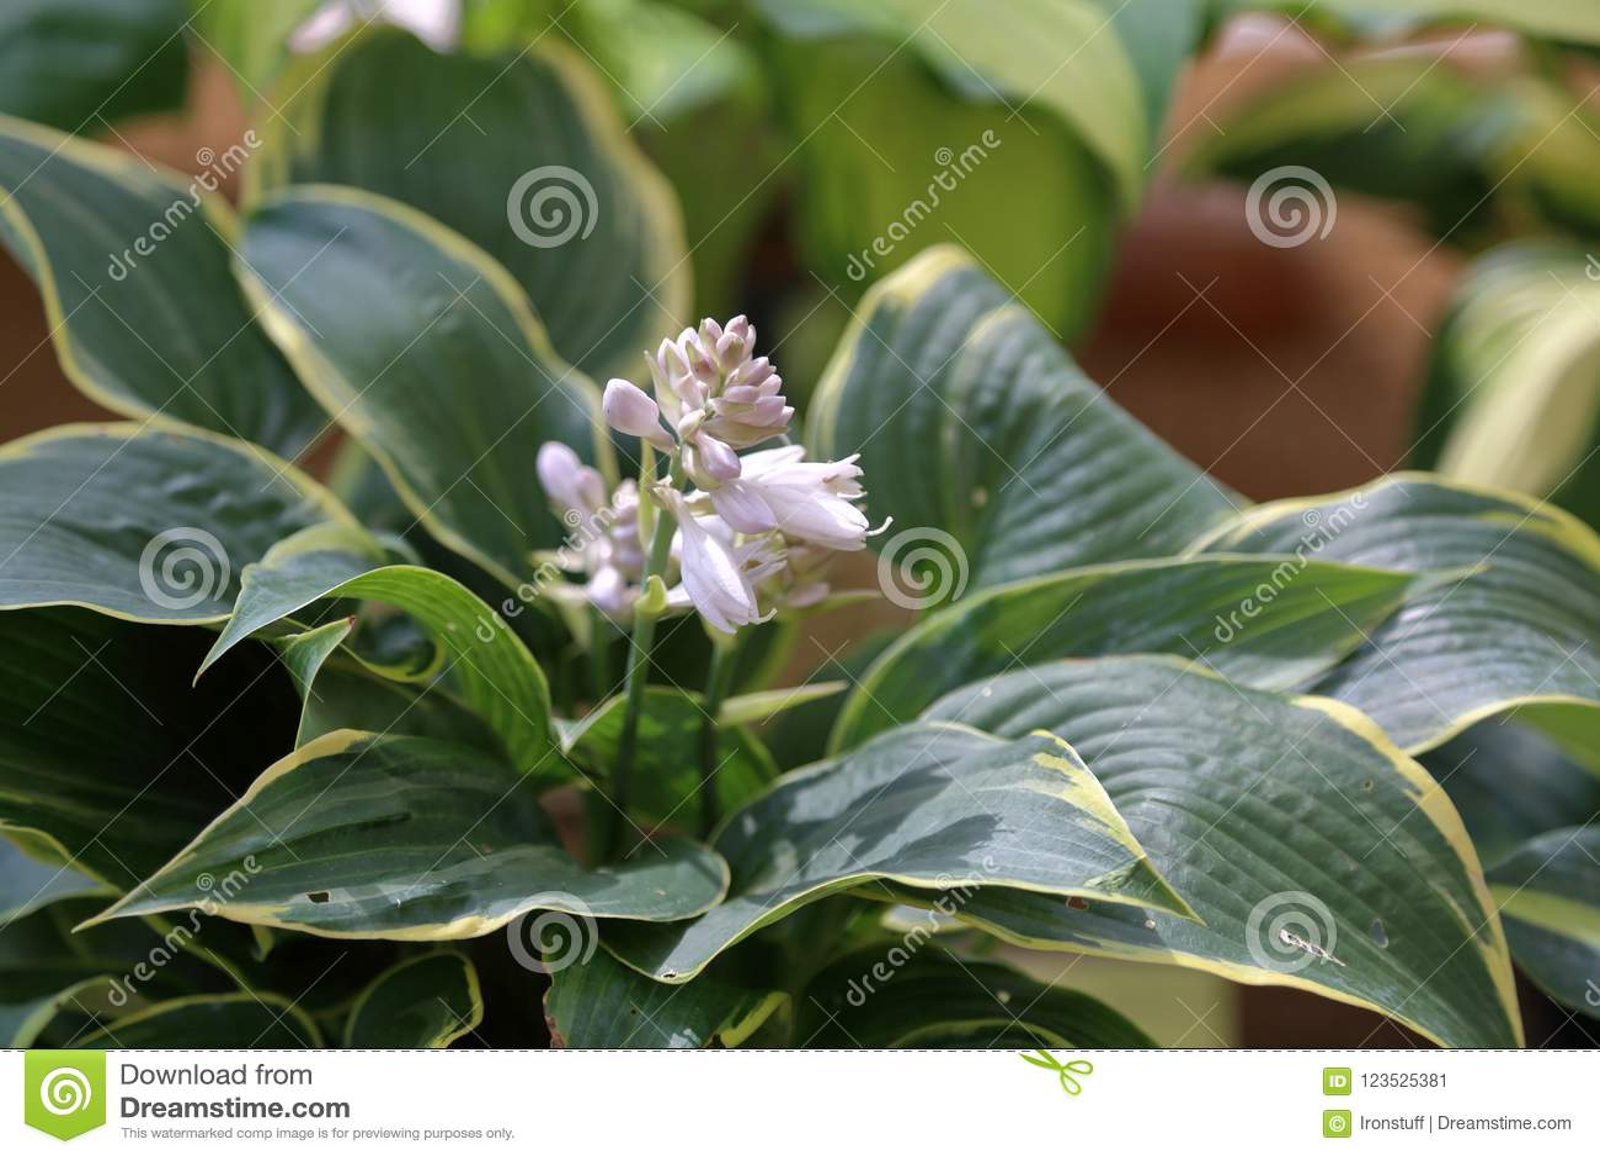 Perennial Plant Hosta Stock Image Image Of Background 123525381